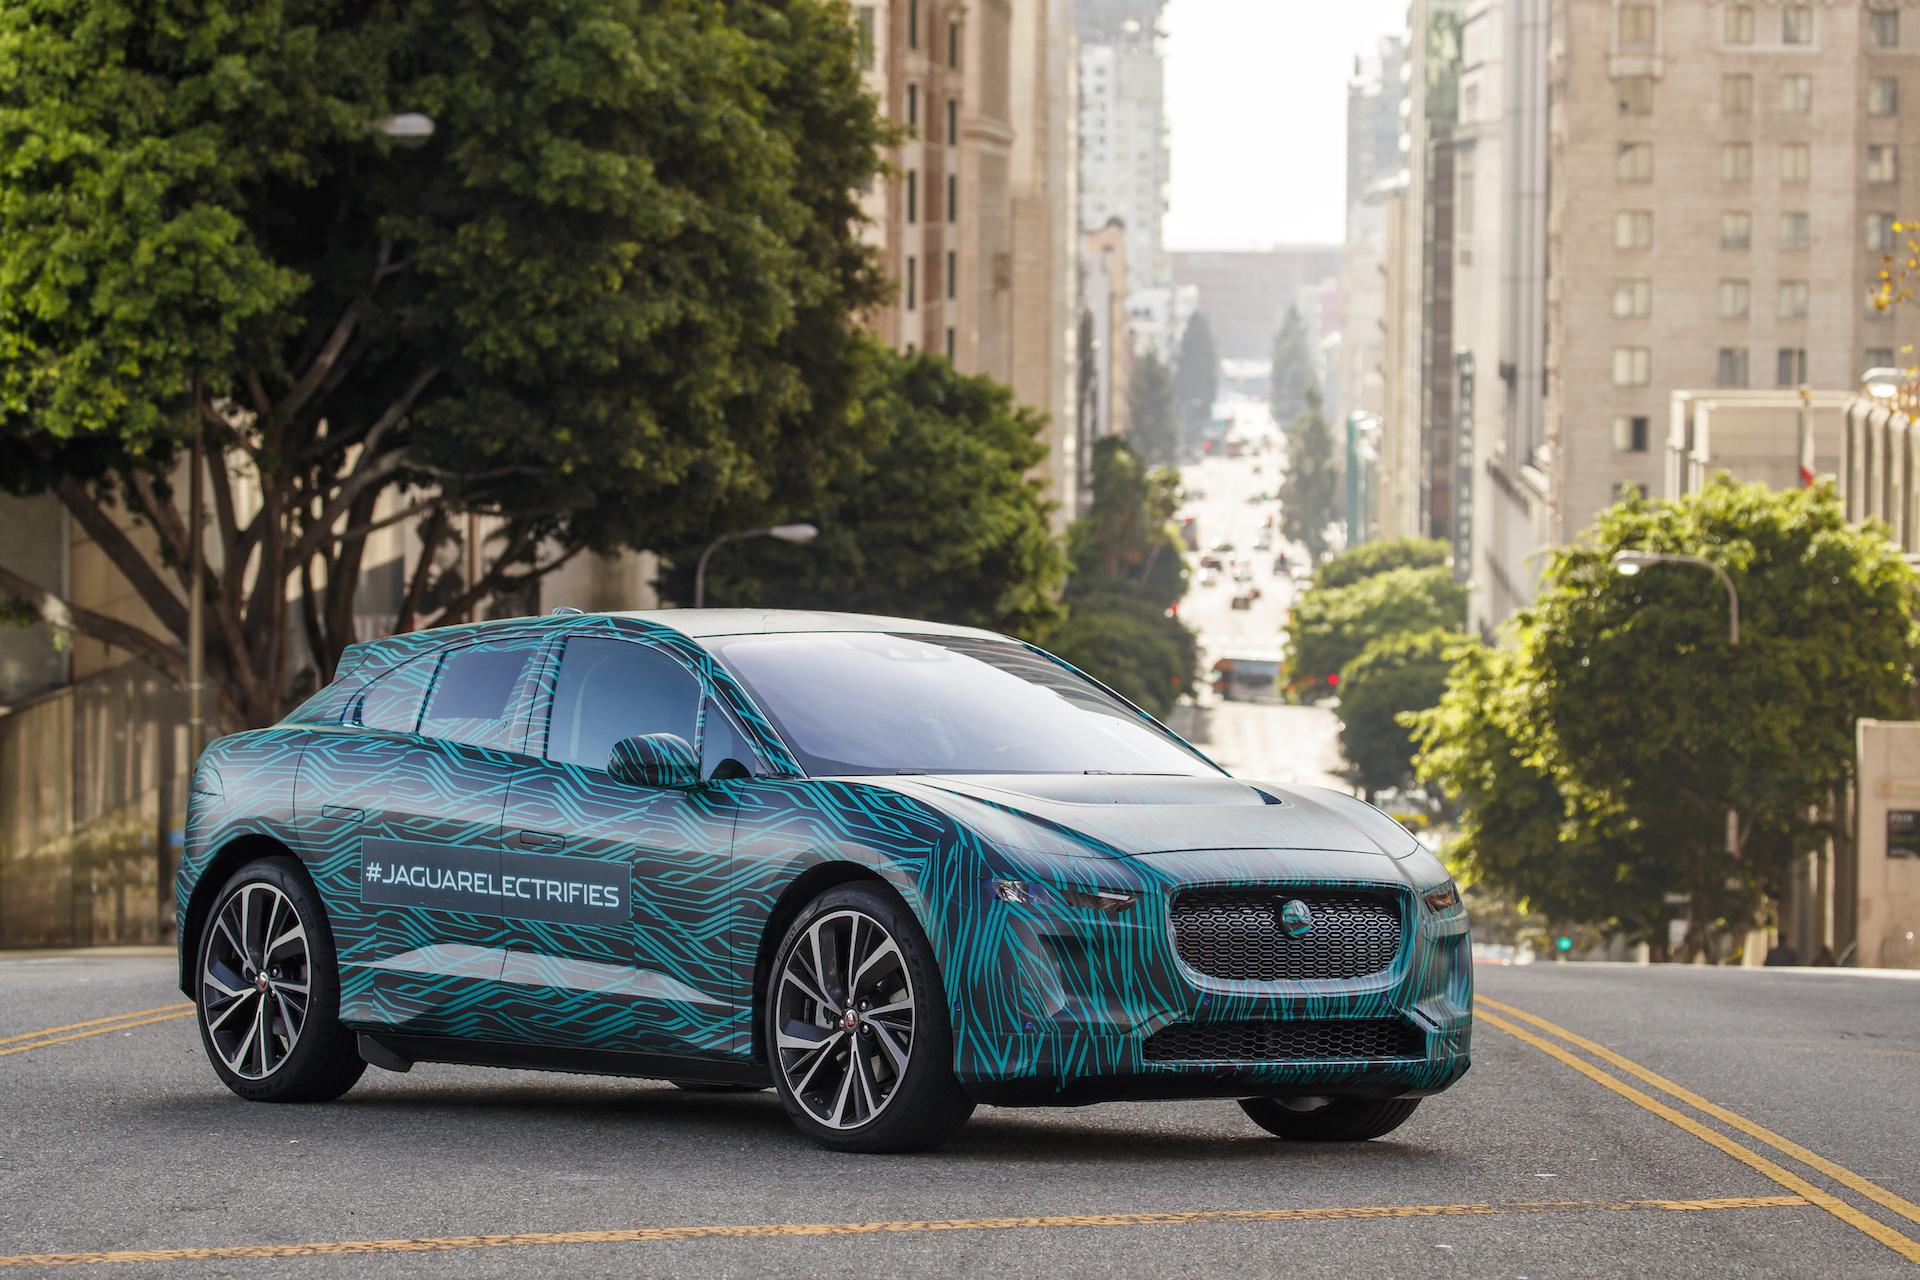 jaguar car city ca fitness auto convertible class los angeles clean dealership benz mileage low california super vehicle revo